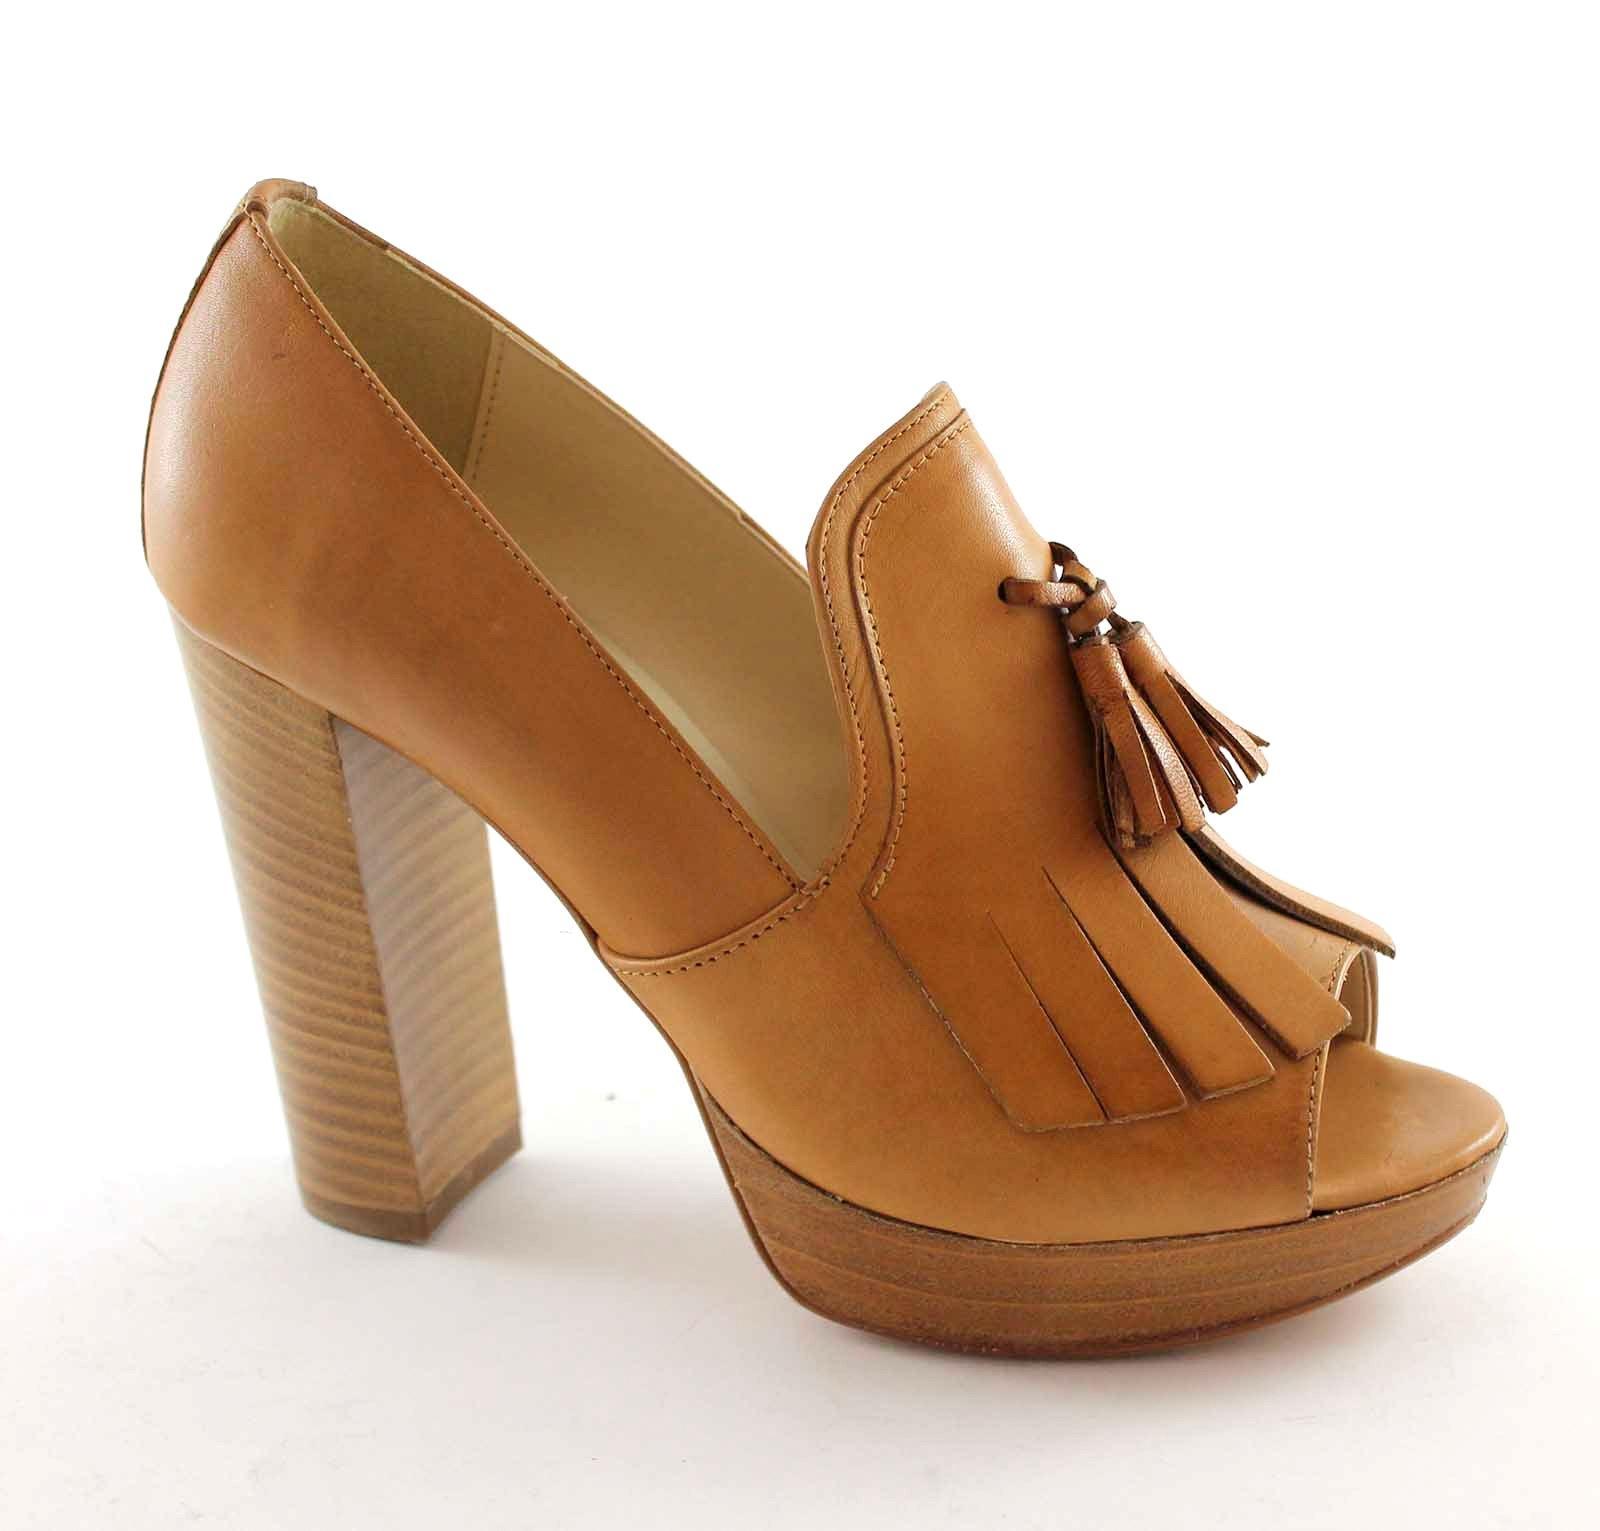 DIVINE FOLLIE 2315 cuoio scarpe  donna spuntata tacco tacco tacco frangia ef5a4b